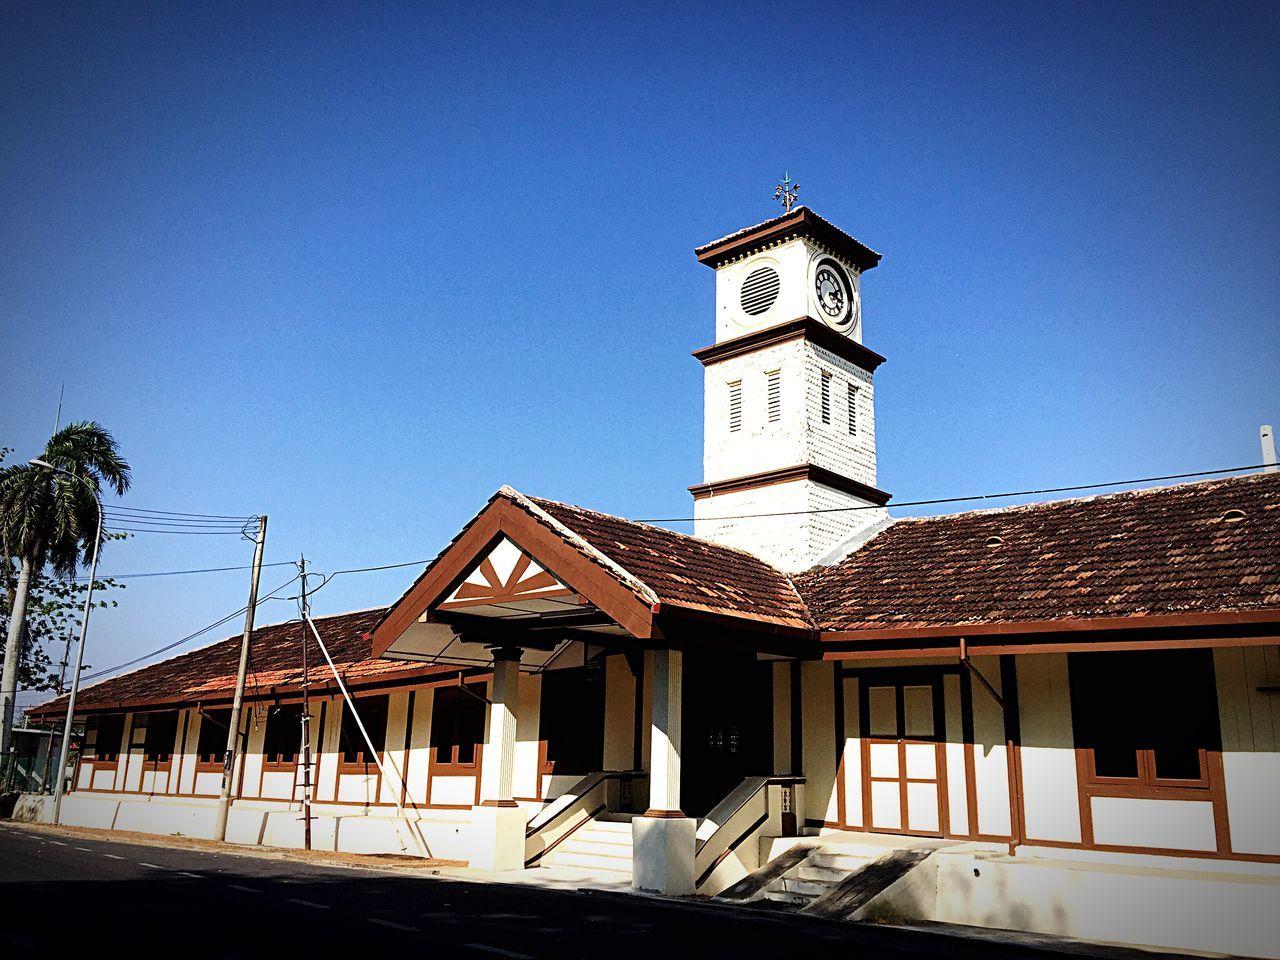 Railway Station Alorstar Kedah Malaysia Landscape_photography Karyarepublic